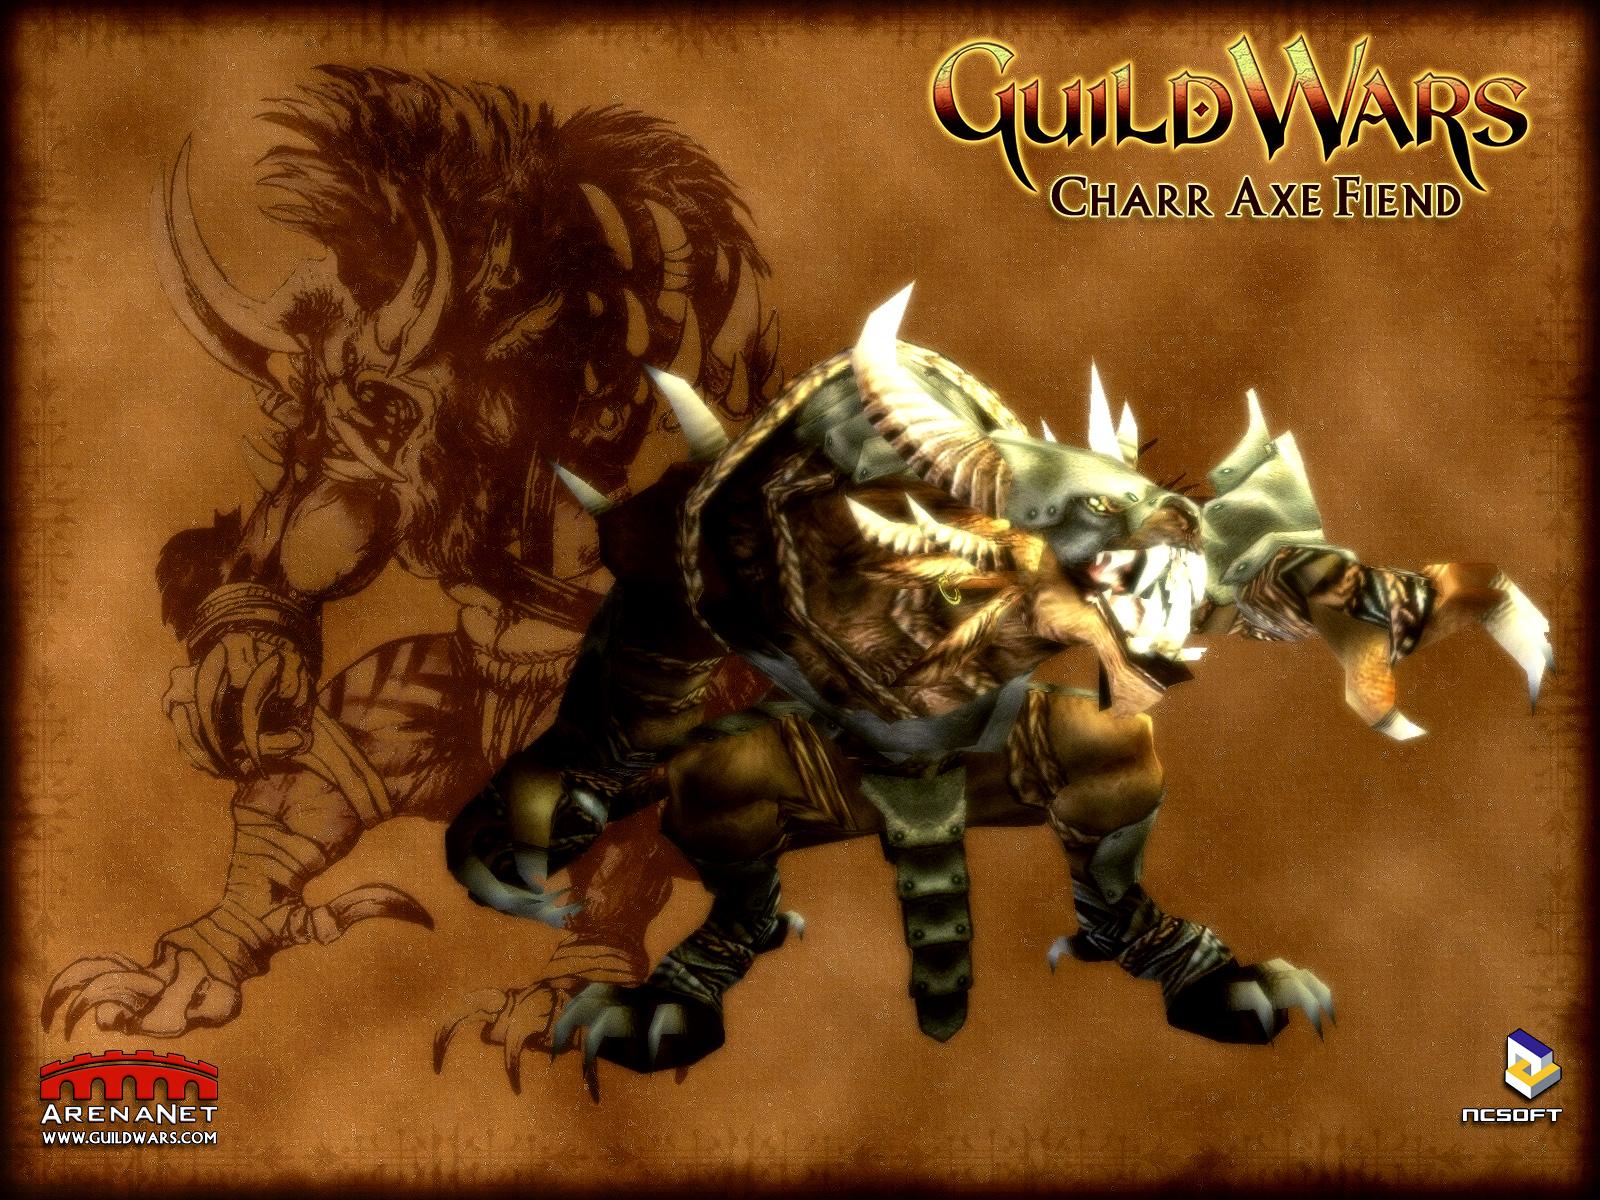 guildwars wallpaper monsters-charraxefiend-1600